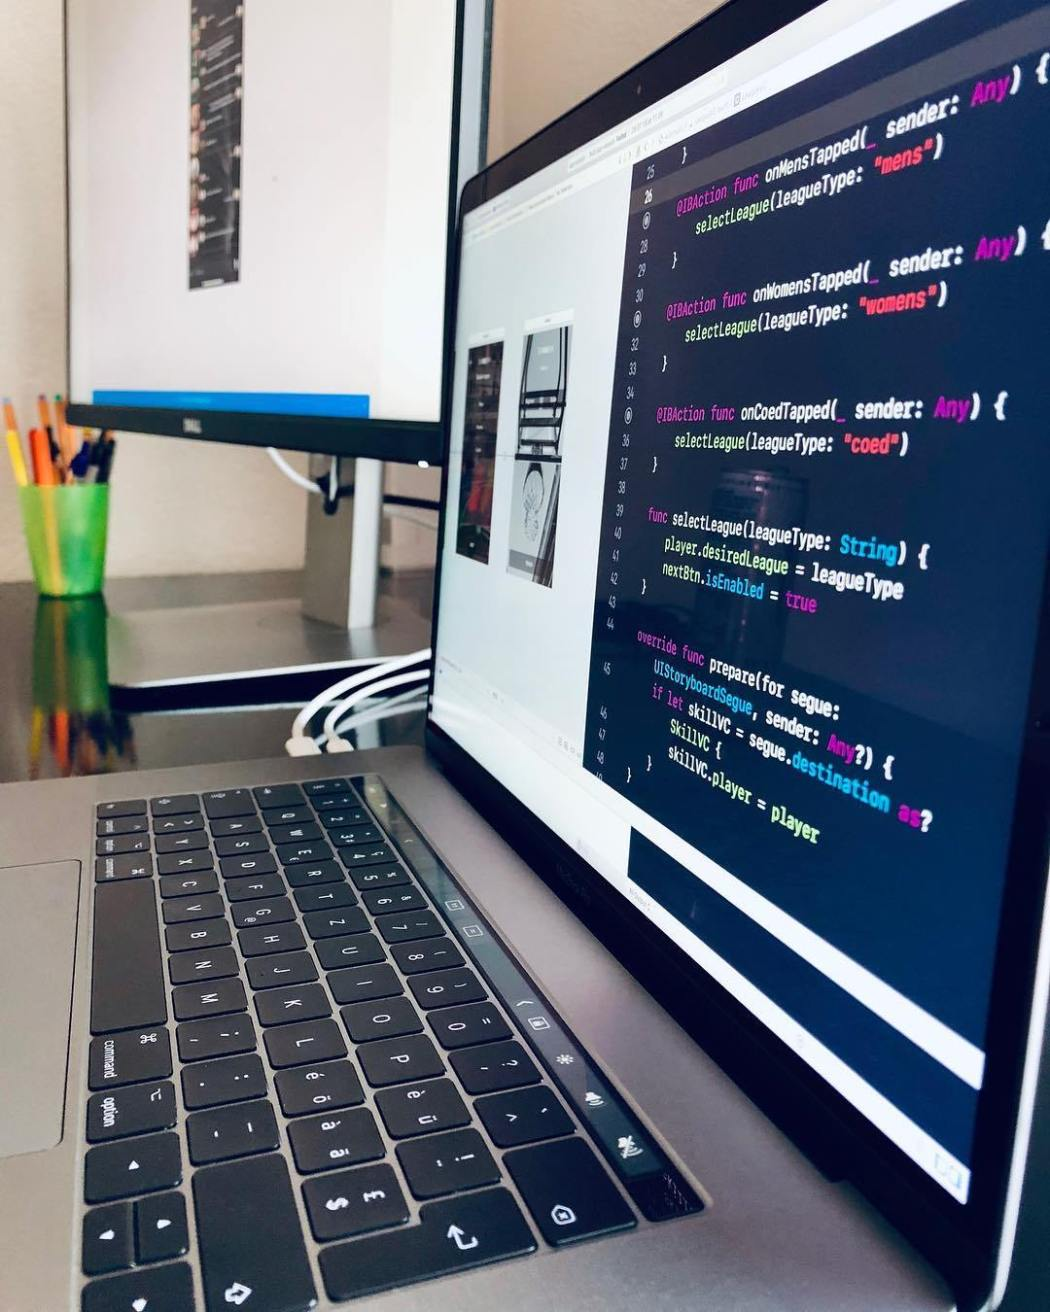 Setup and Workspace inspiration